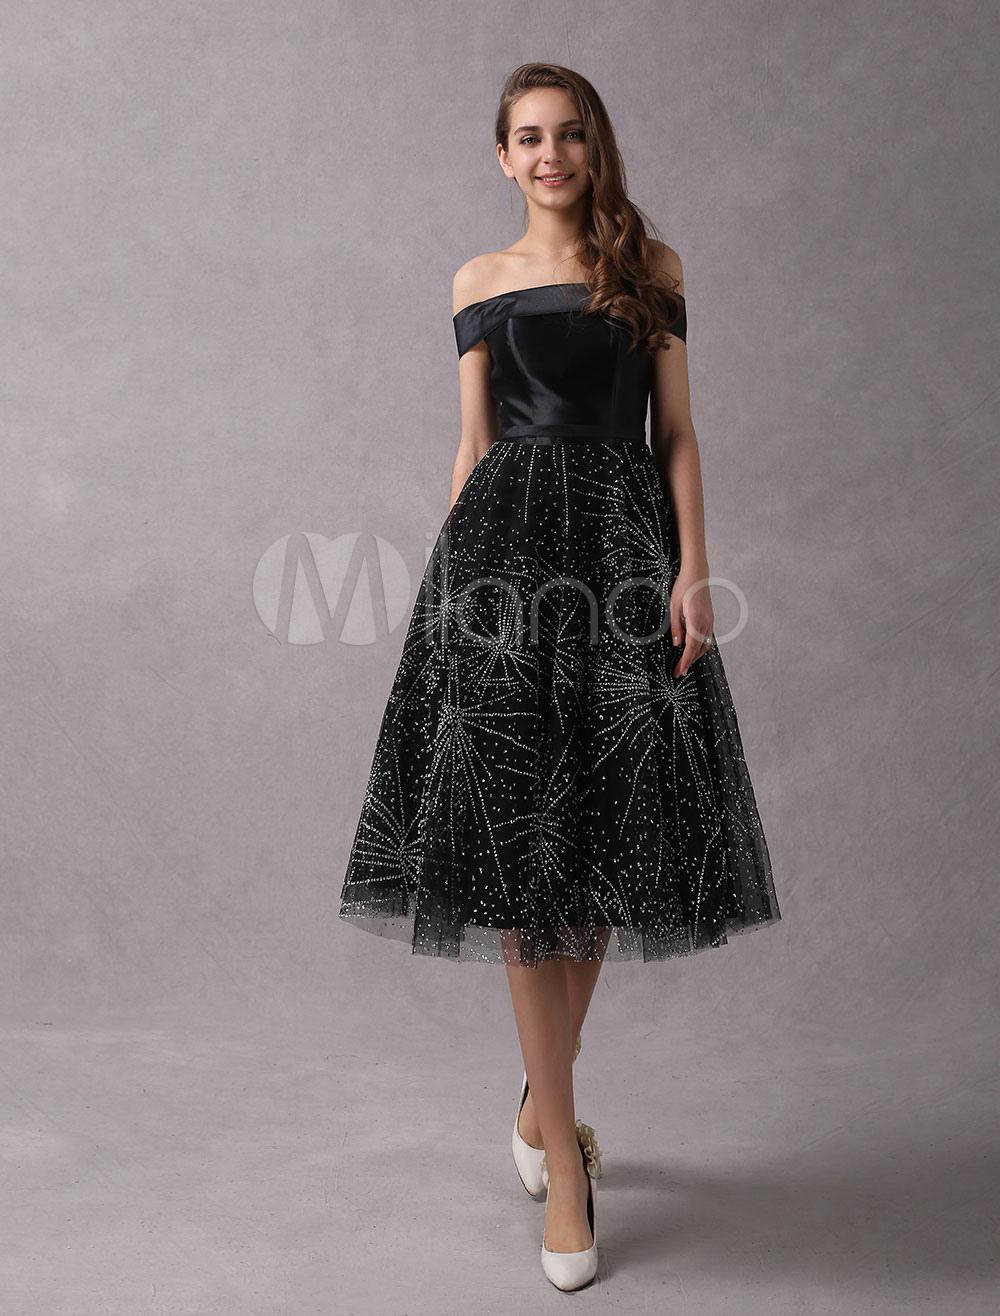 Short Prom Dresses Black Off The Shoulder Graduation Dress Sequin Tea Length Party Dresses (Wedding Cocktail Dresses) photo